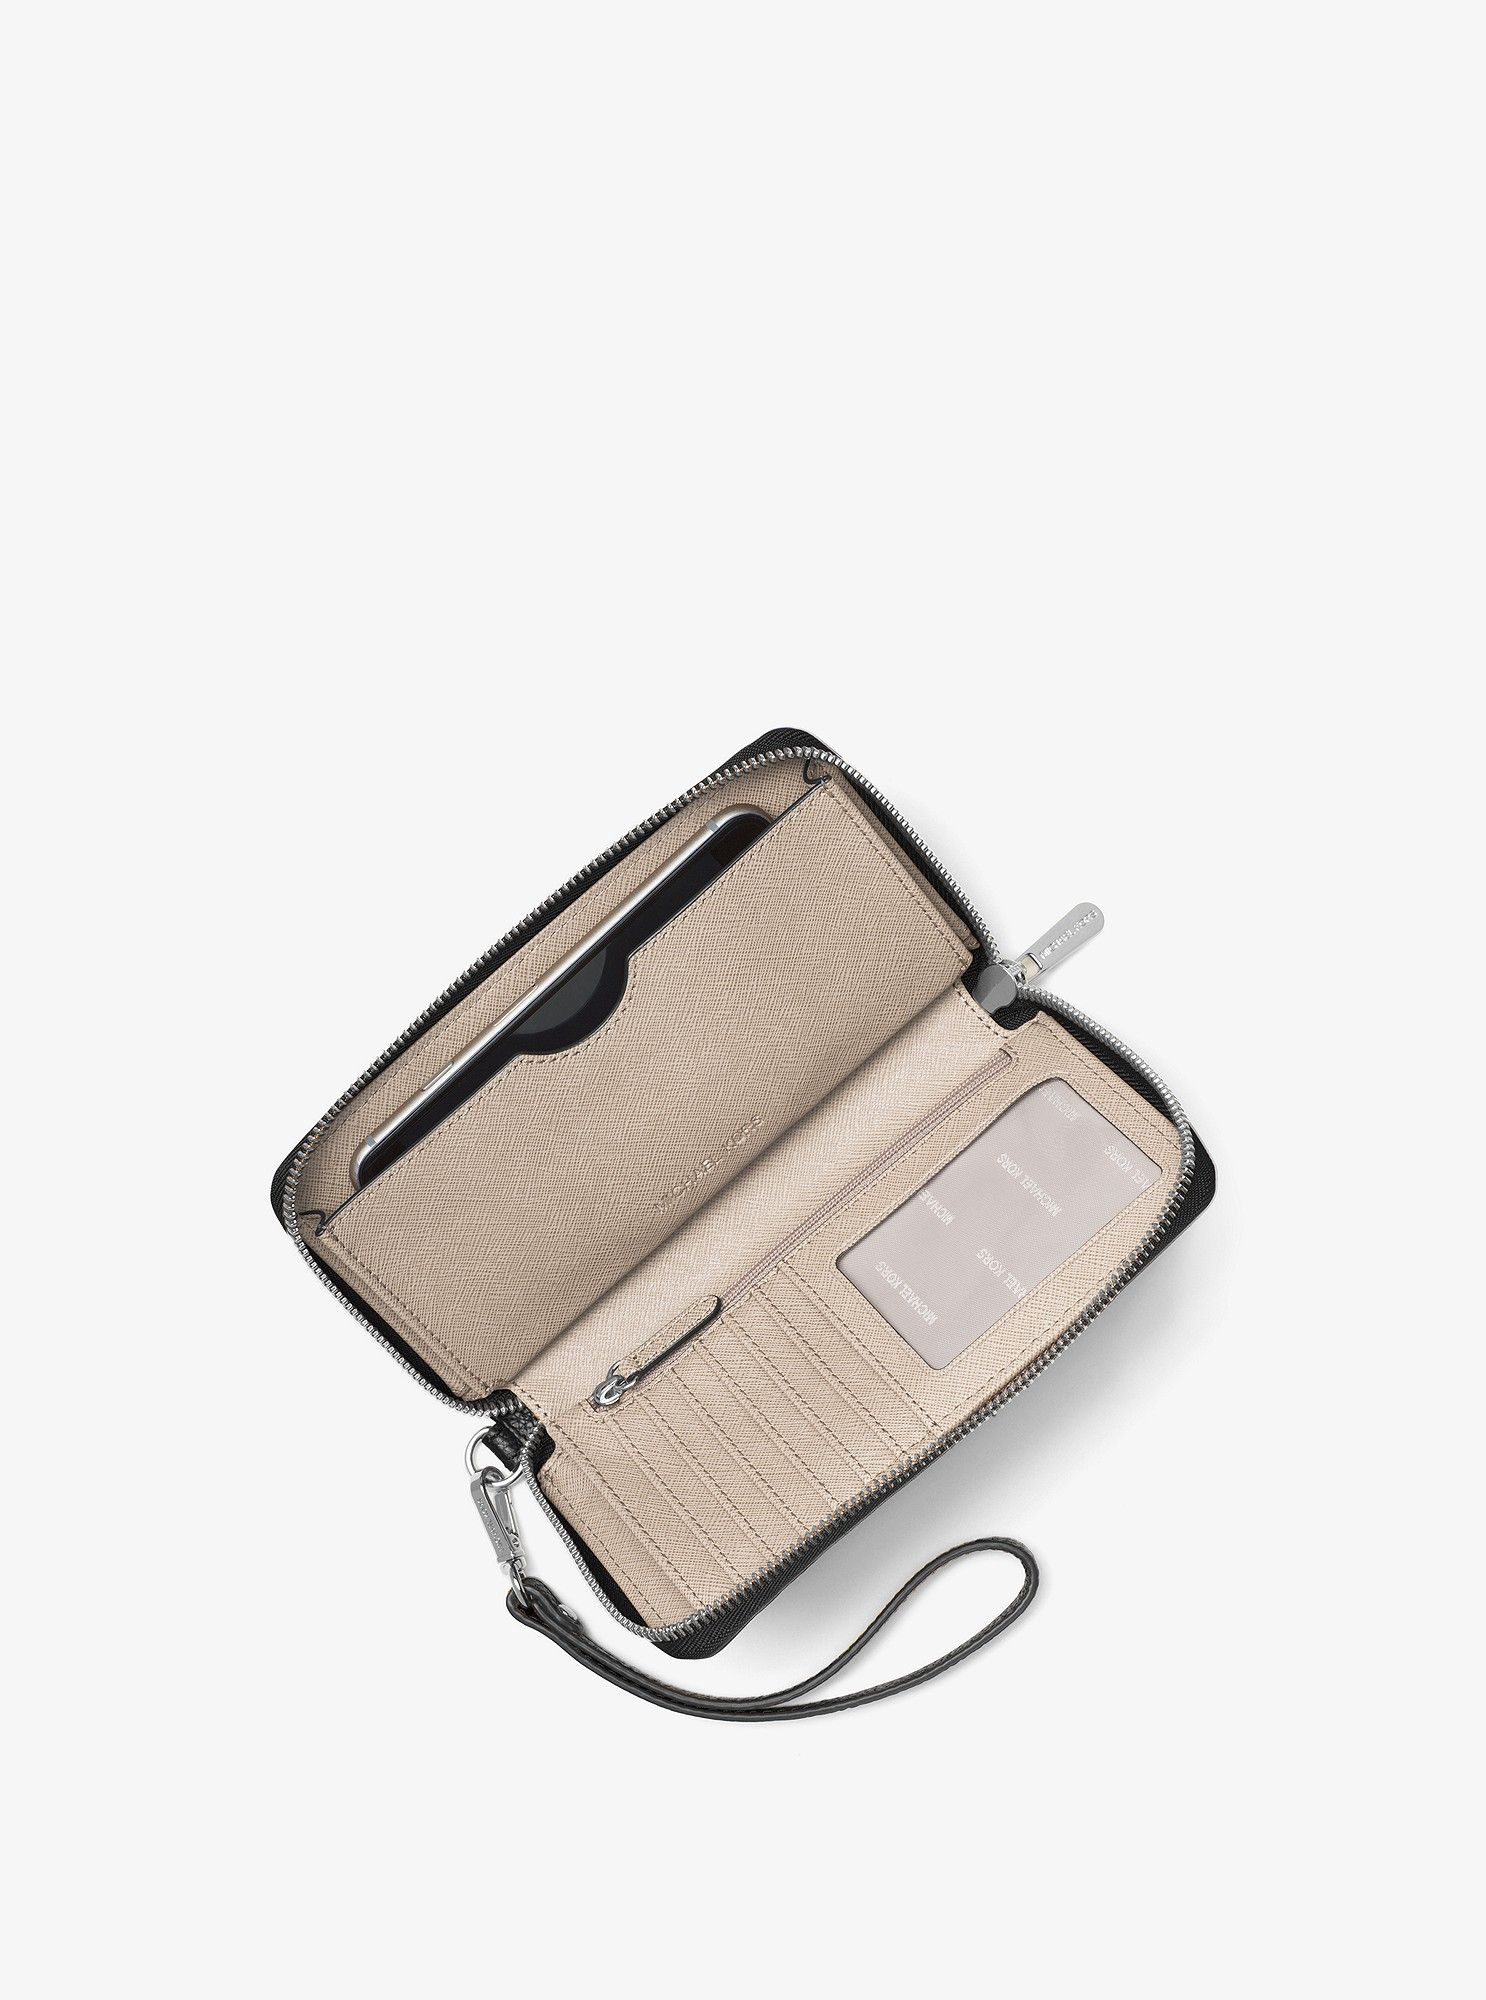 7626b2df9bfe Michael Kors Mercer Large Leather Smartphone Wristlet - Pearl Grey